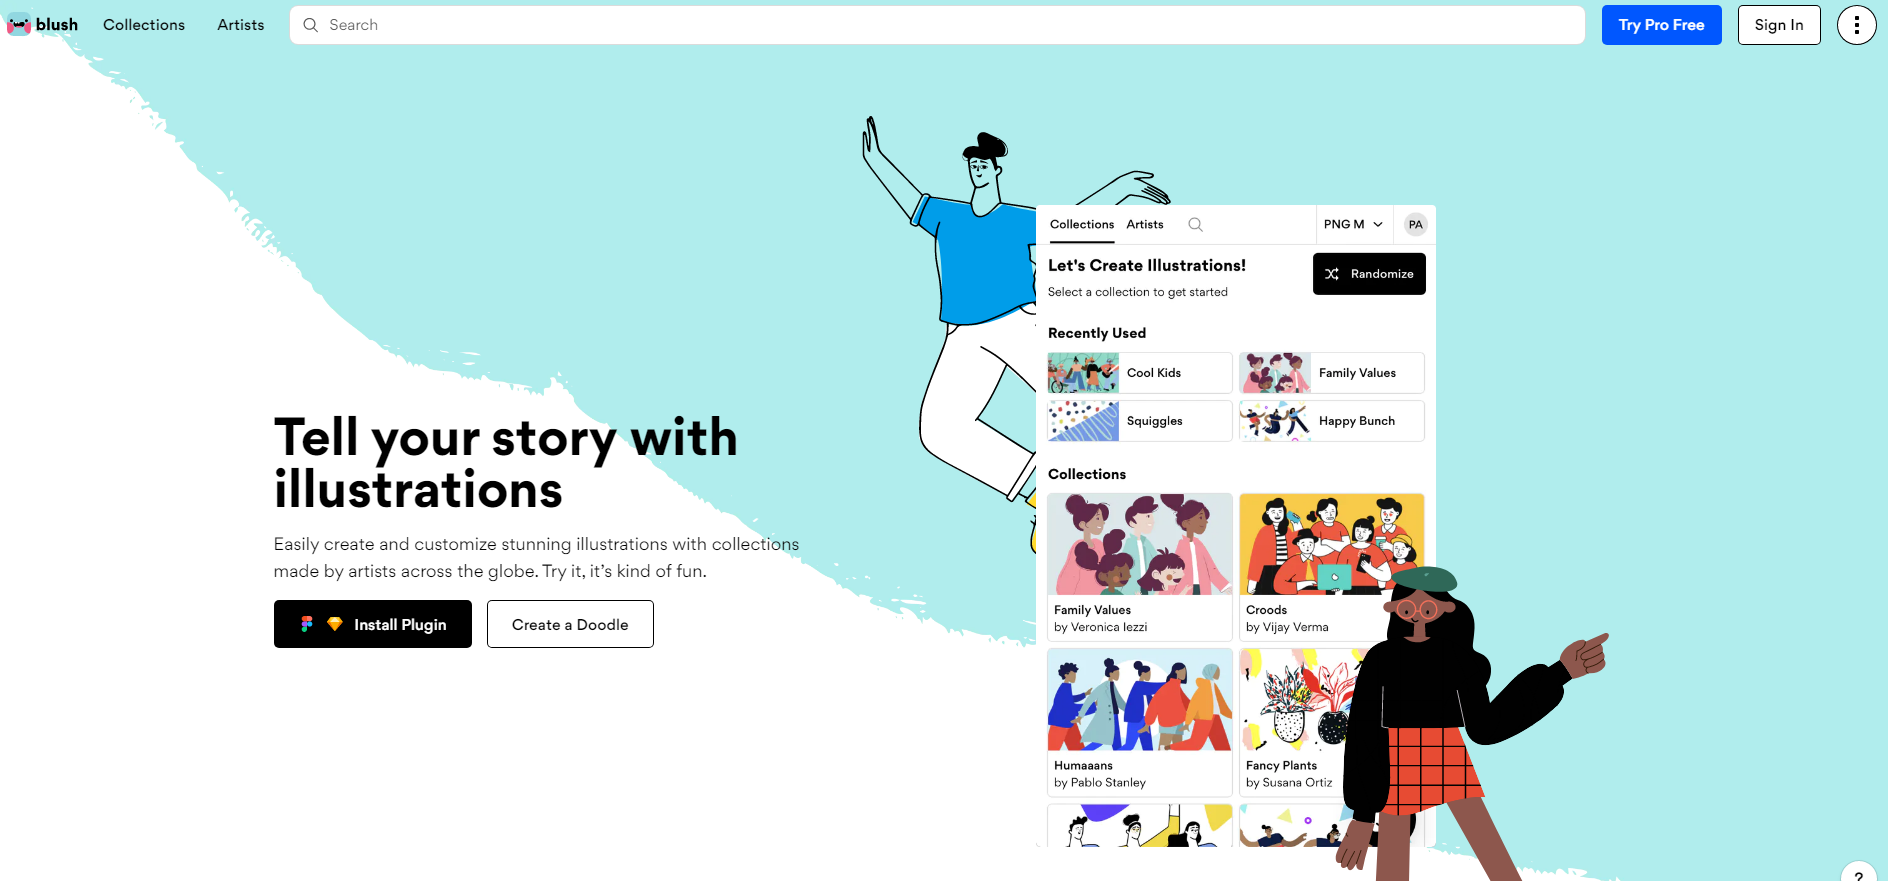 illustrations,ილუსტრაციები,icons